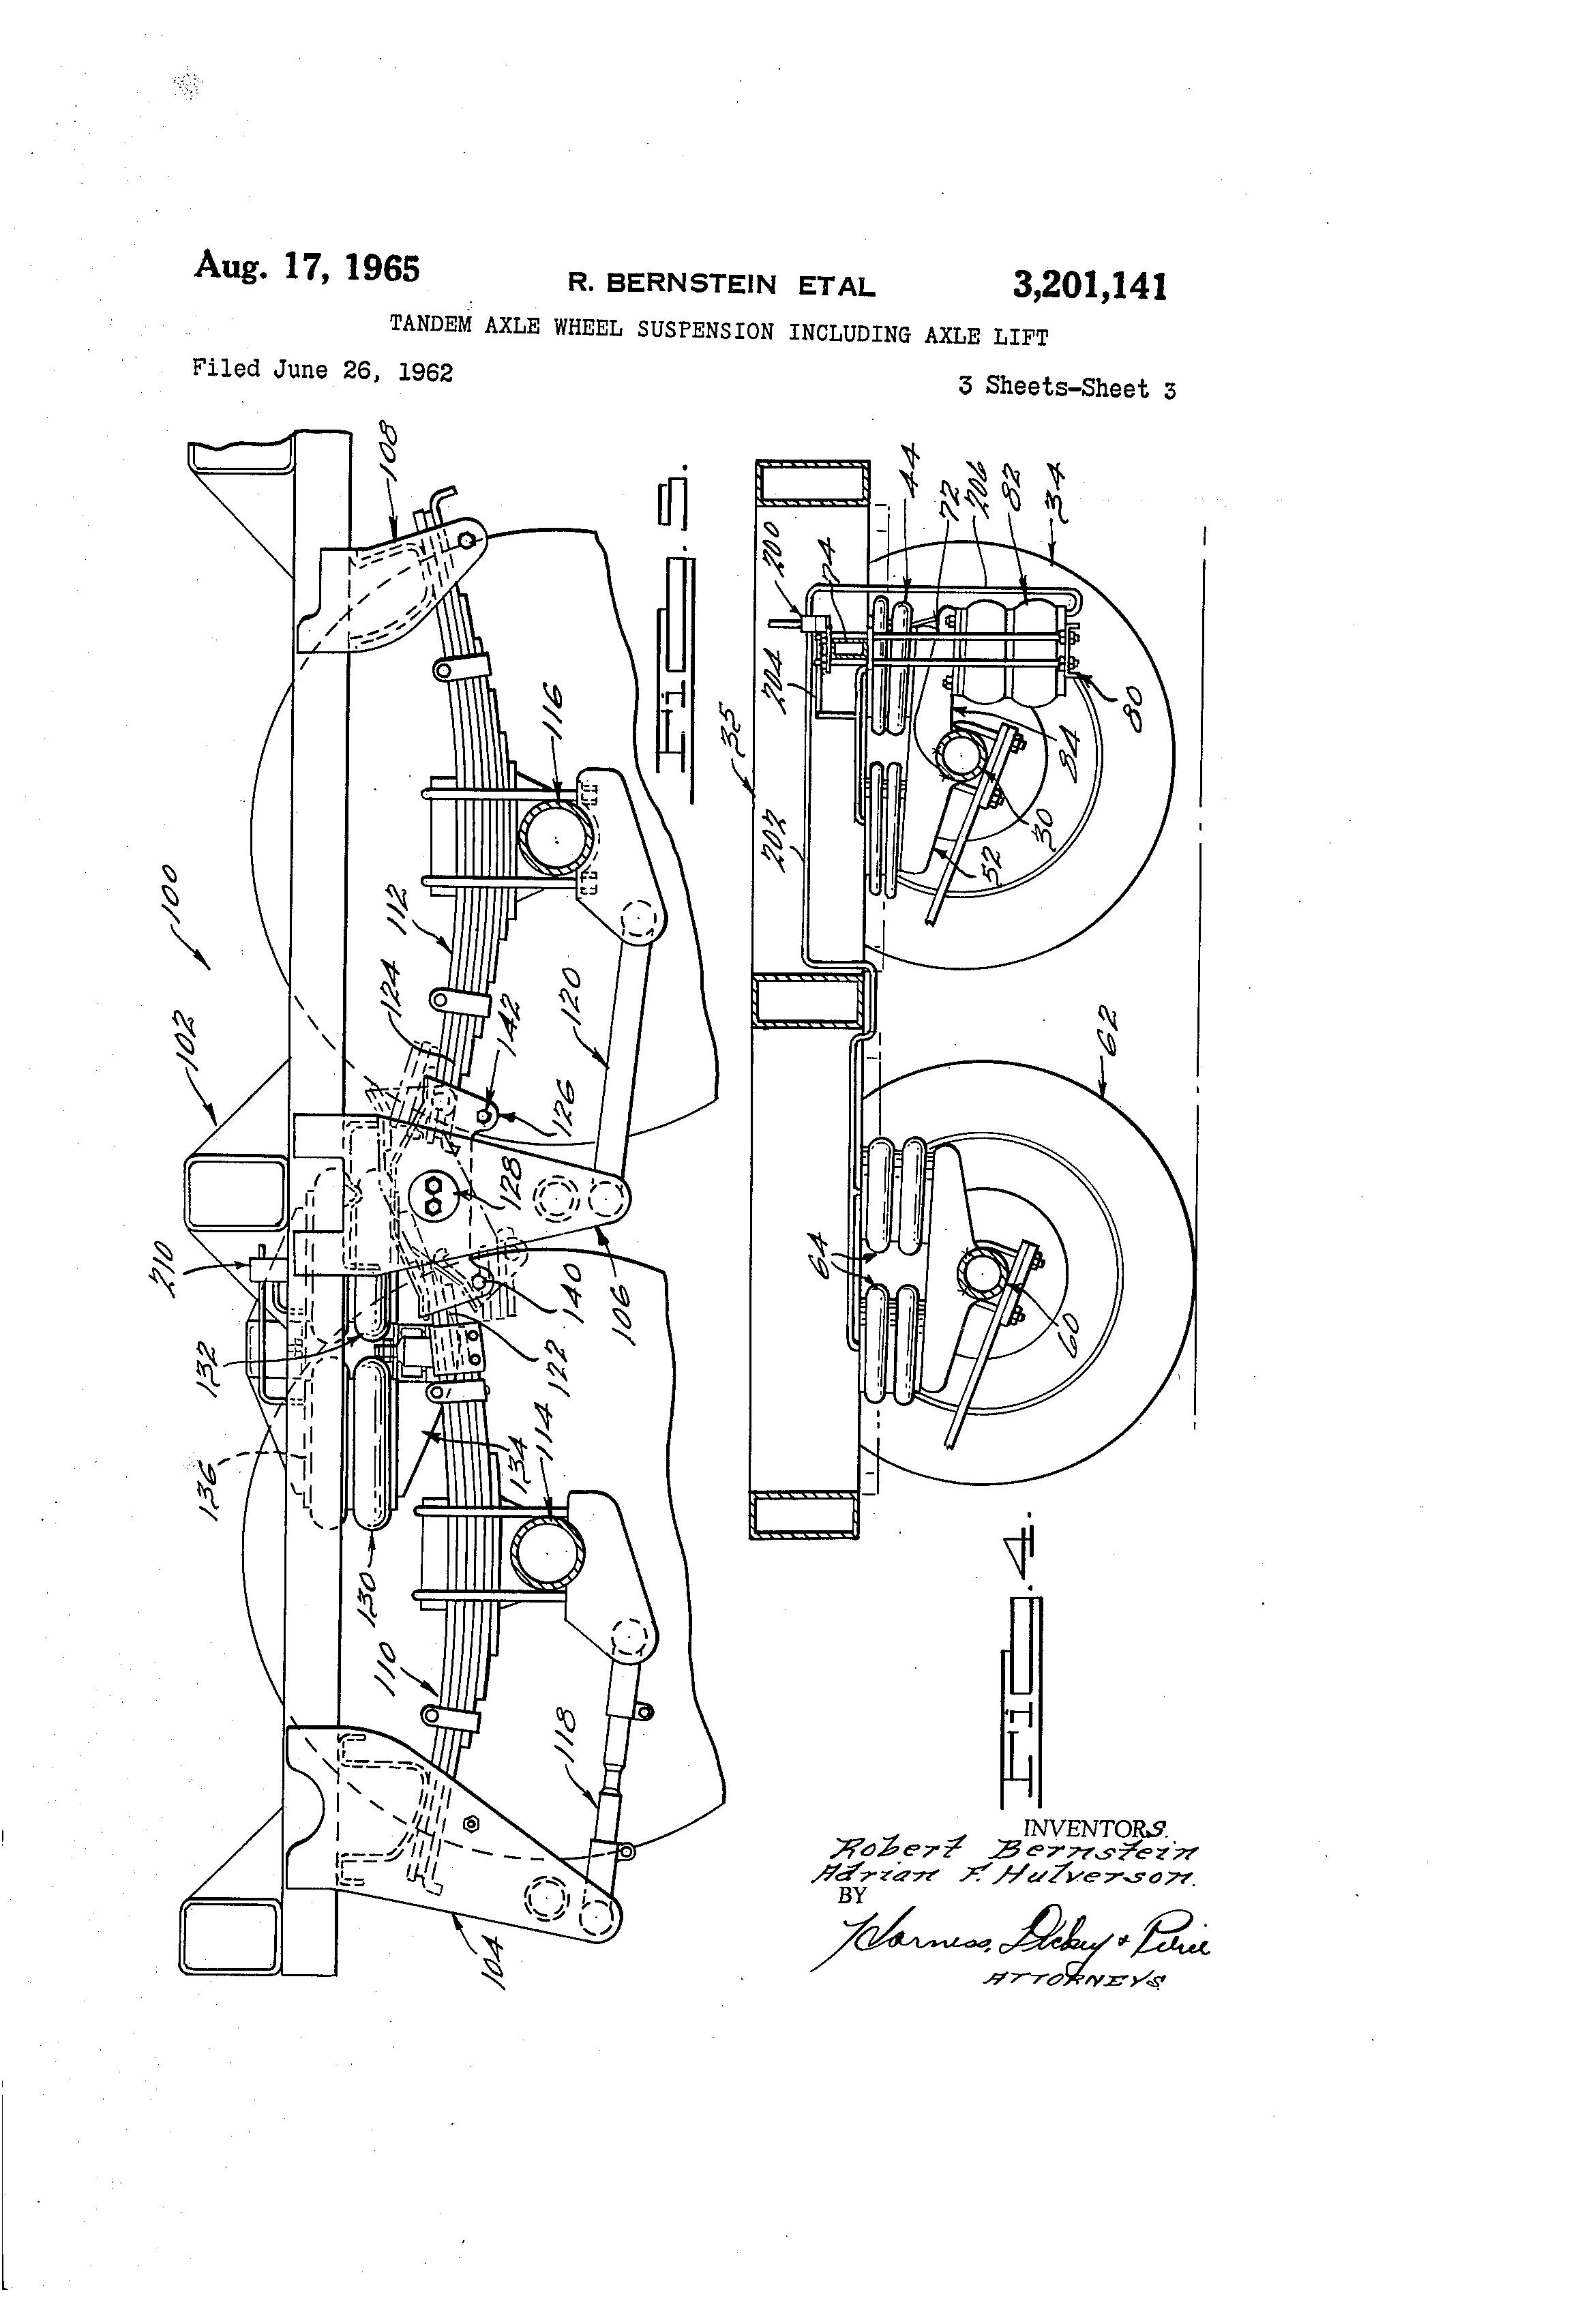 Air Bag Plumbing Diagram - Wiring Diagrams Air Bag Dump Valve Schematic on